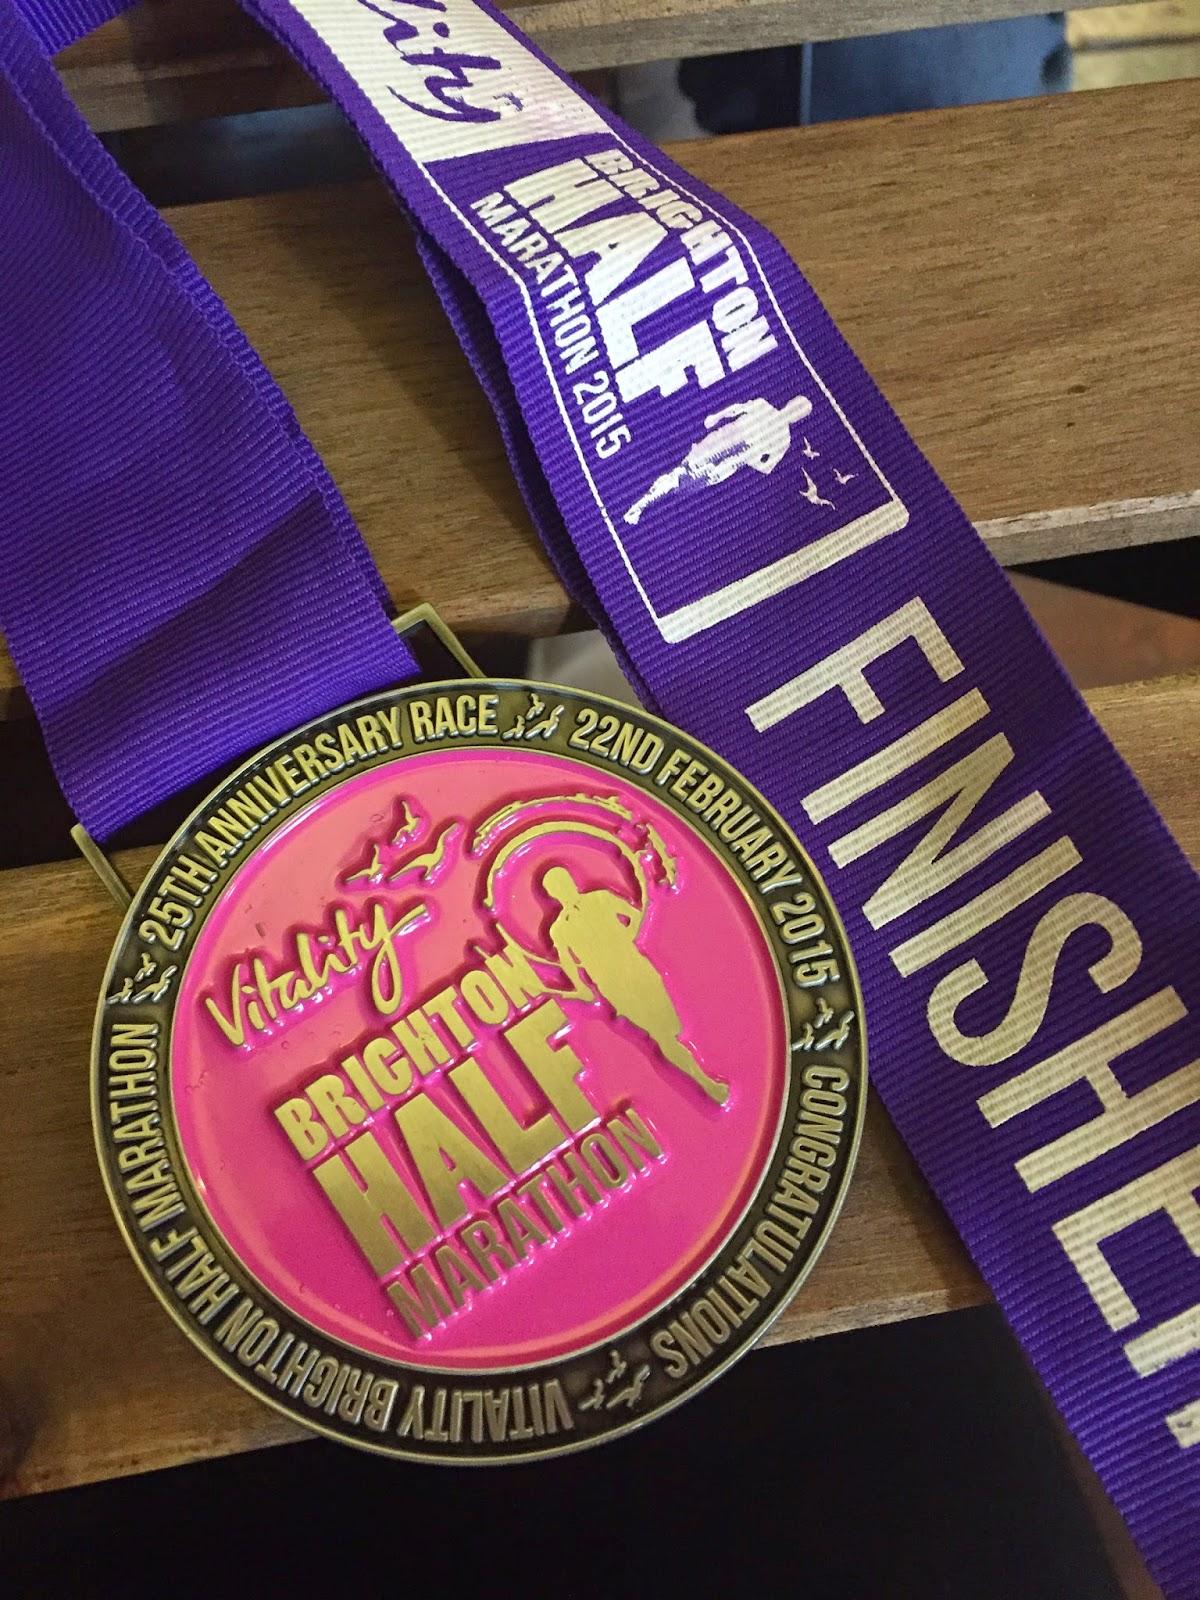 Brighton Half Marathon Medal